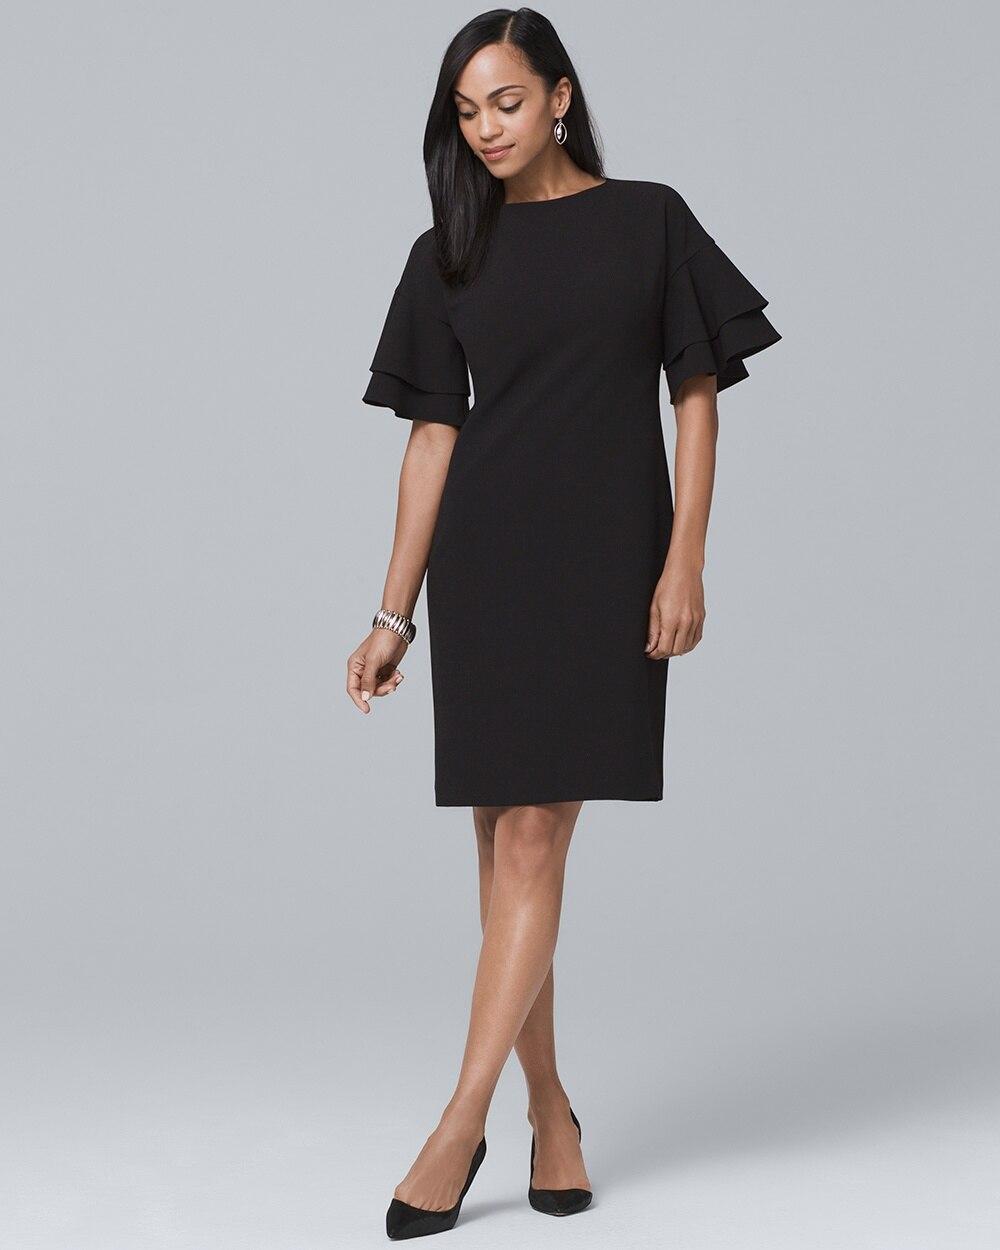 Ruffle Sleeve Black Shift Dress White House Black Market